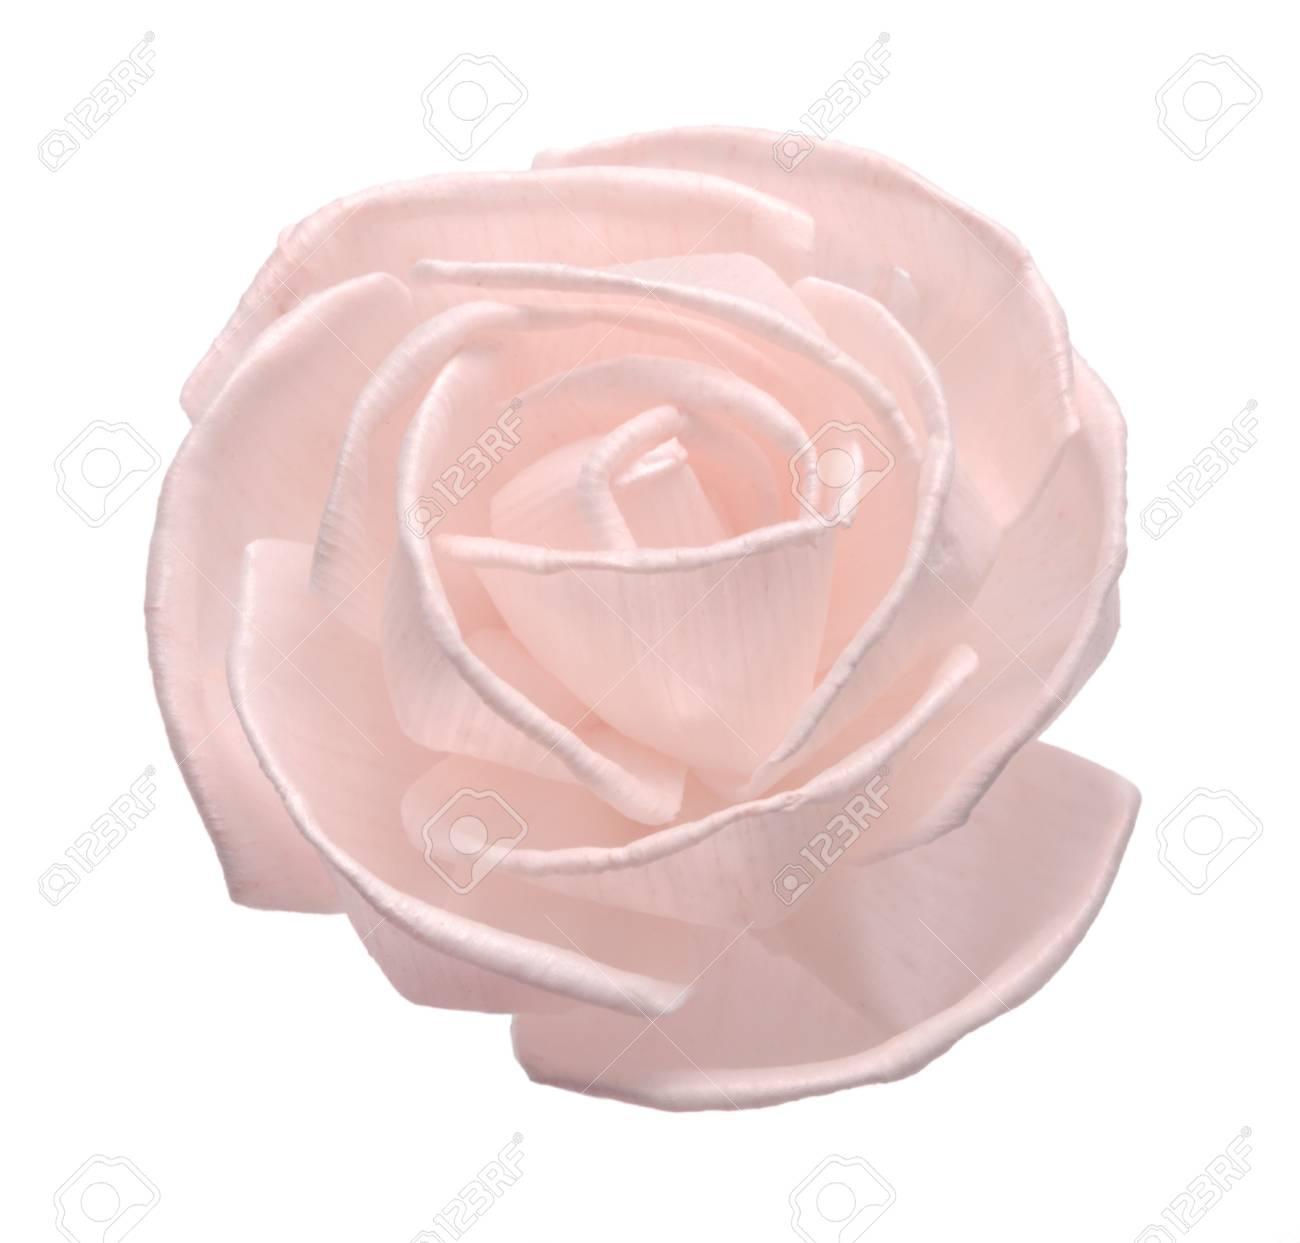 rose craft flower isolated on white background Stock Photo - 18621908